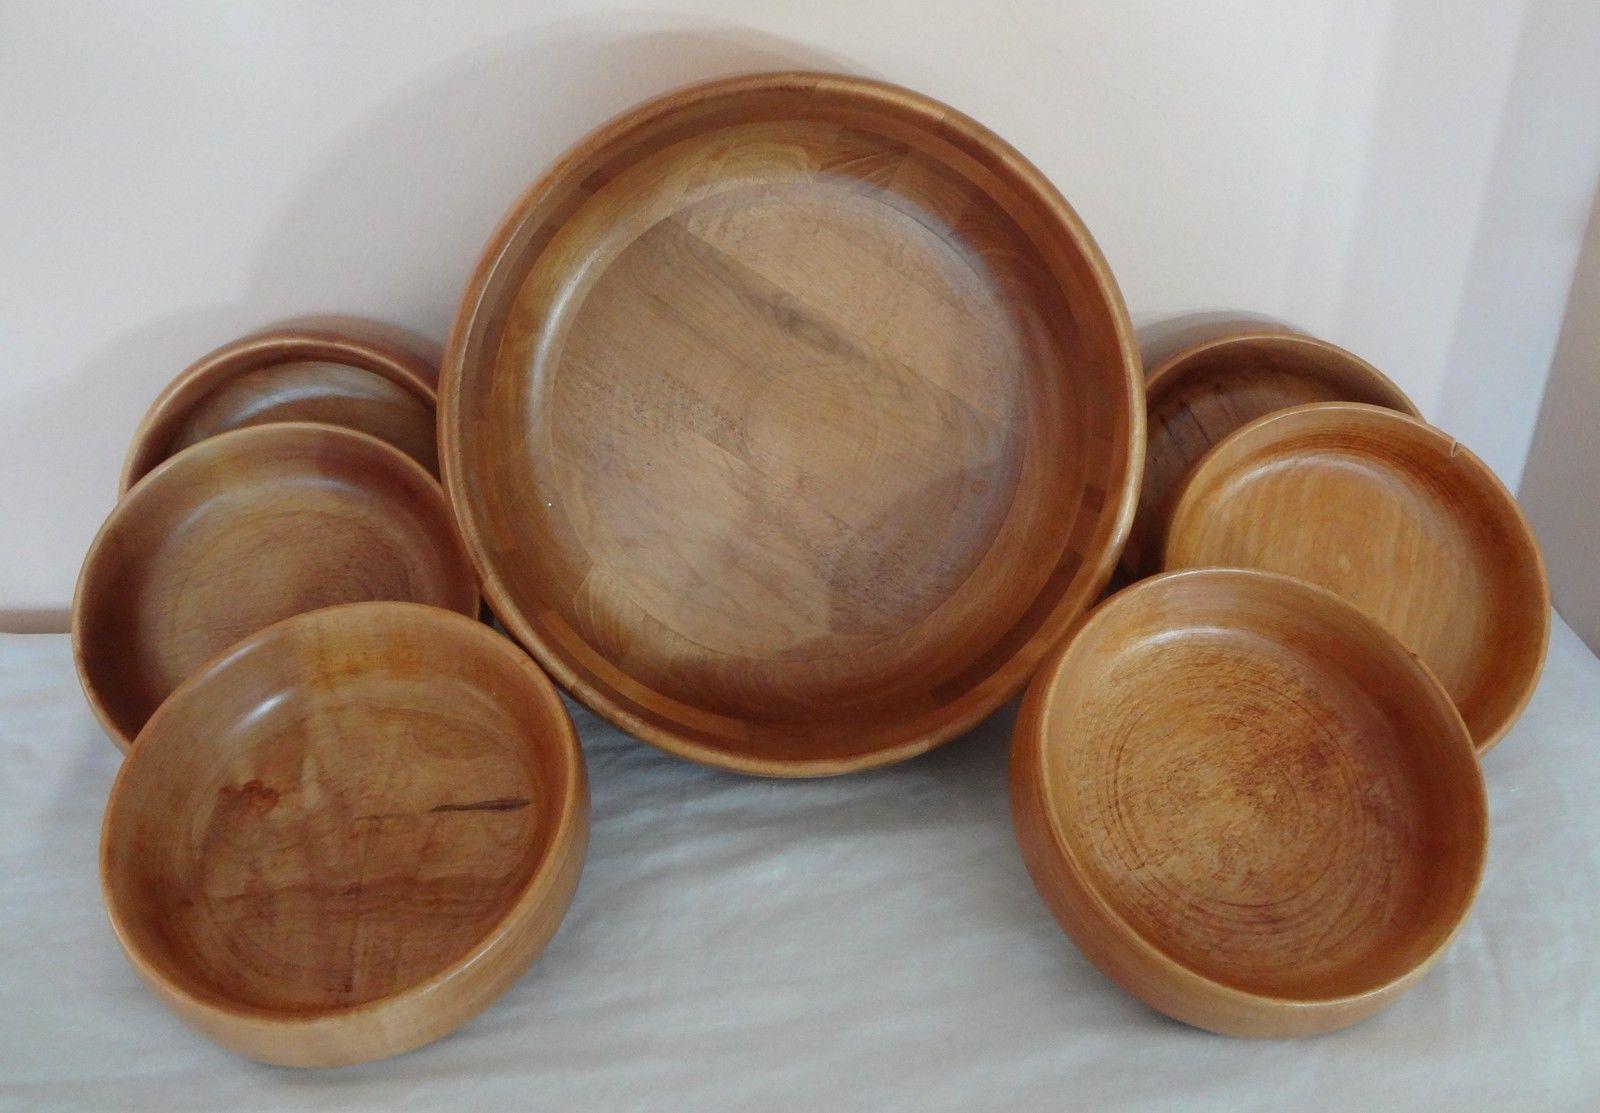 Piece baribocraft salad wood wooden bowl set maple